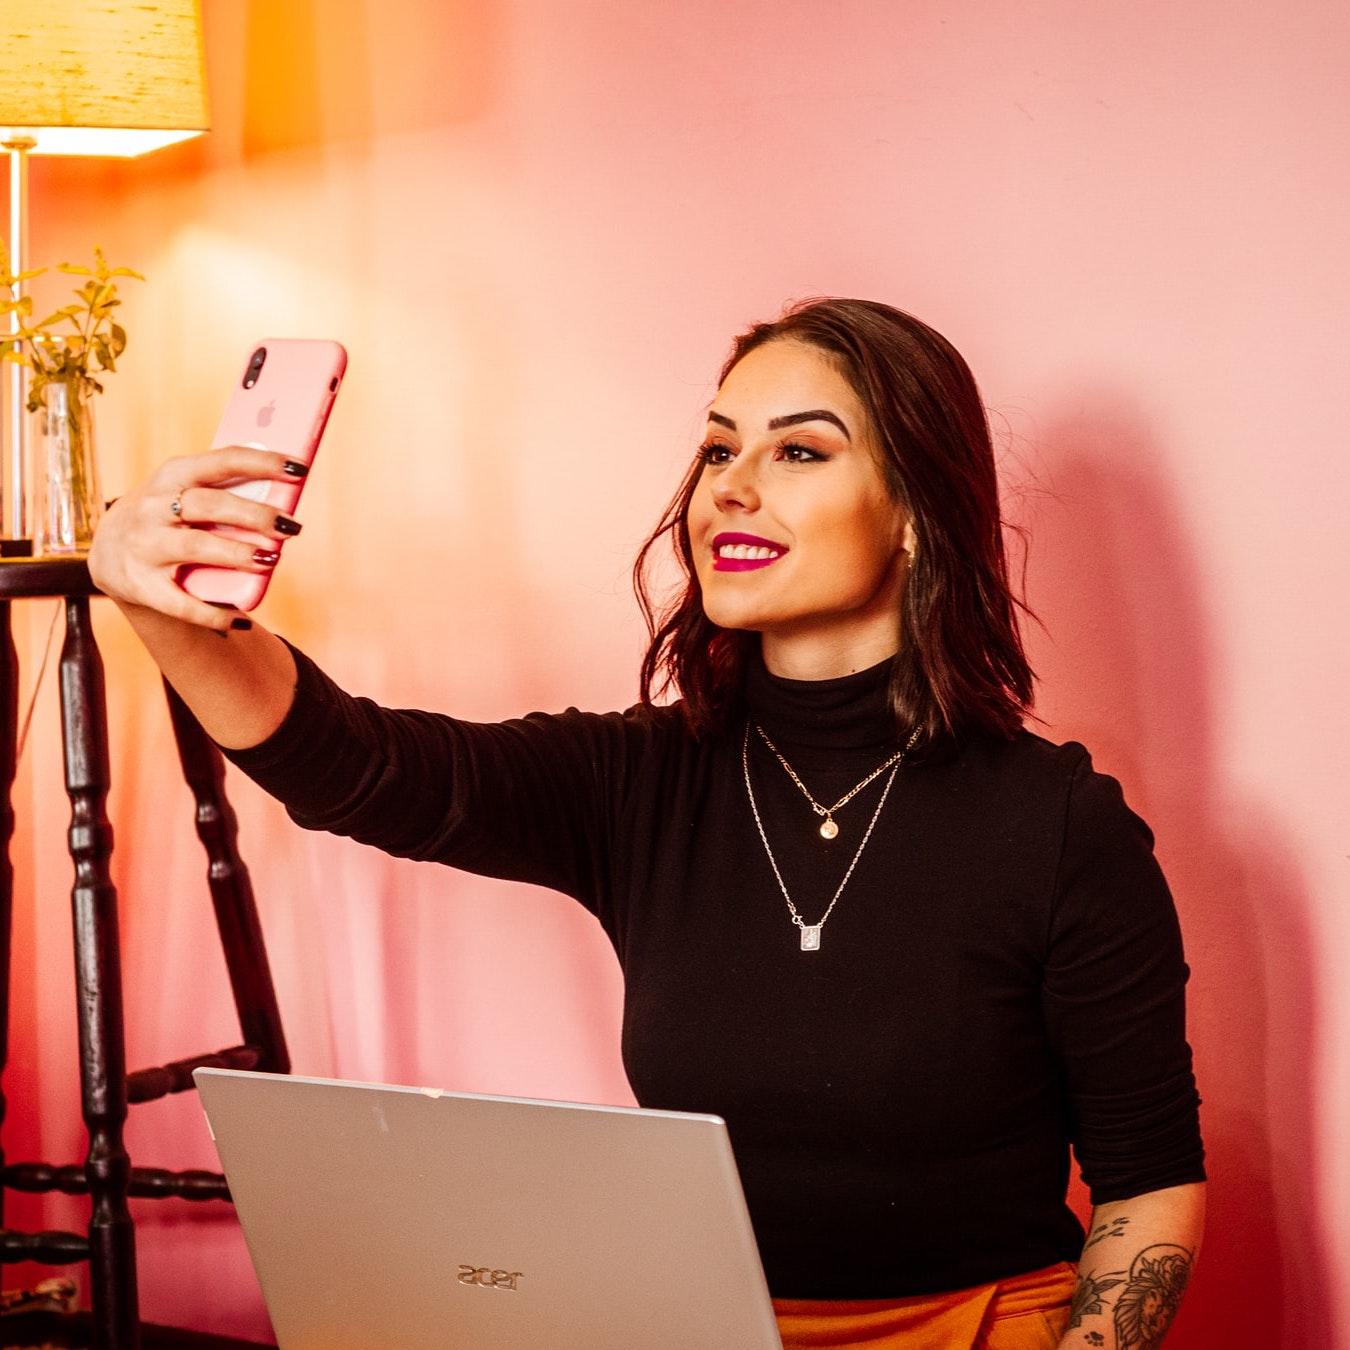 influencer selfie tiktok instagram